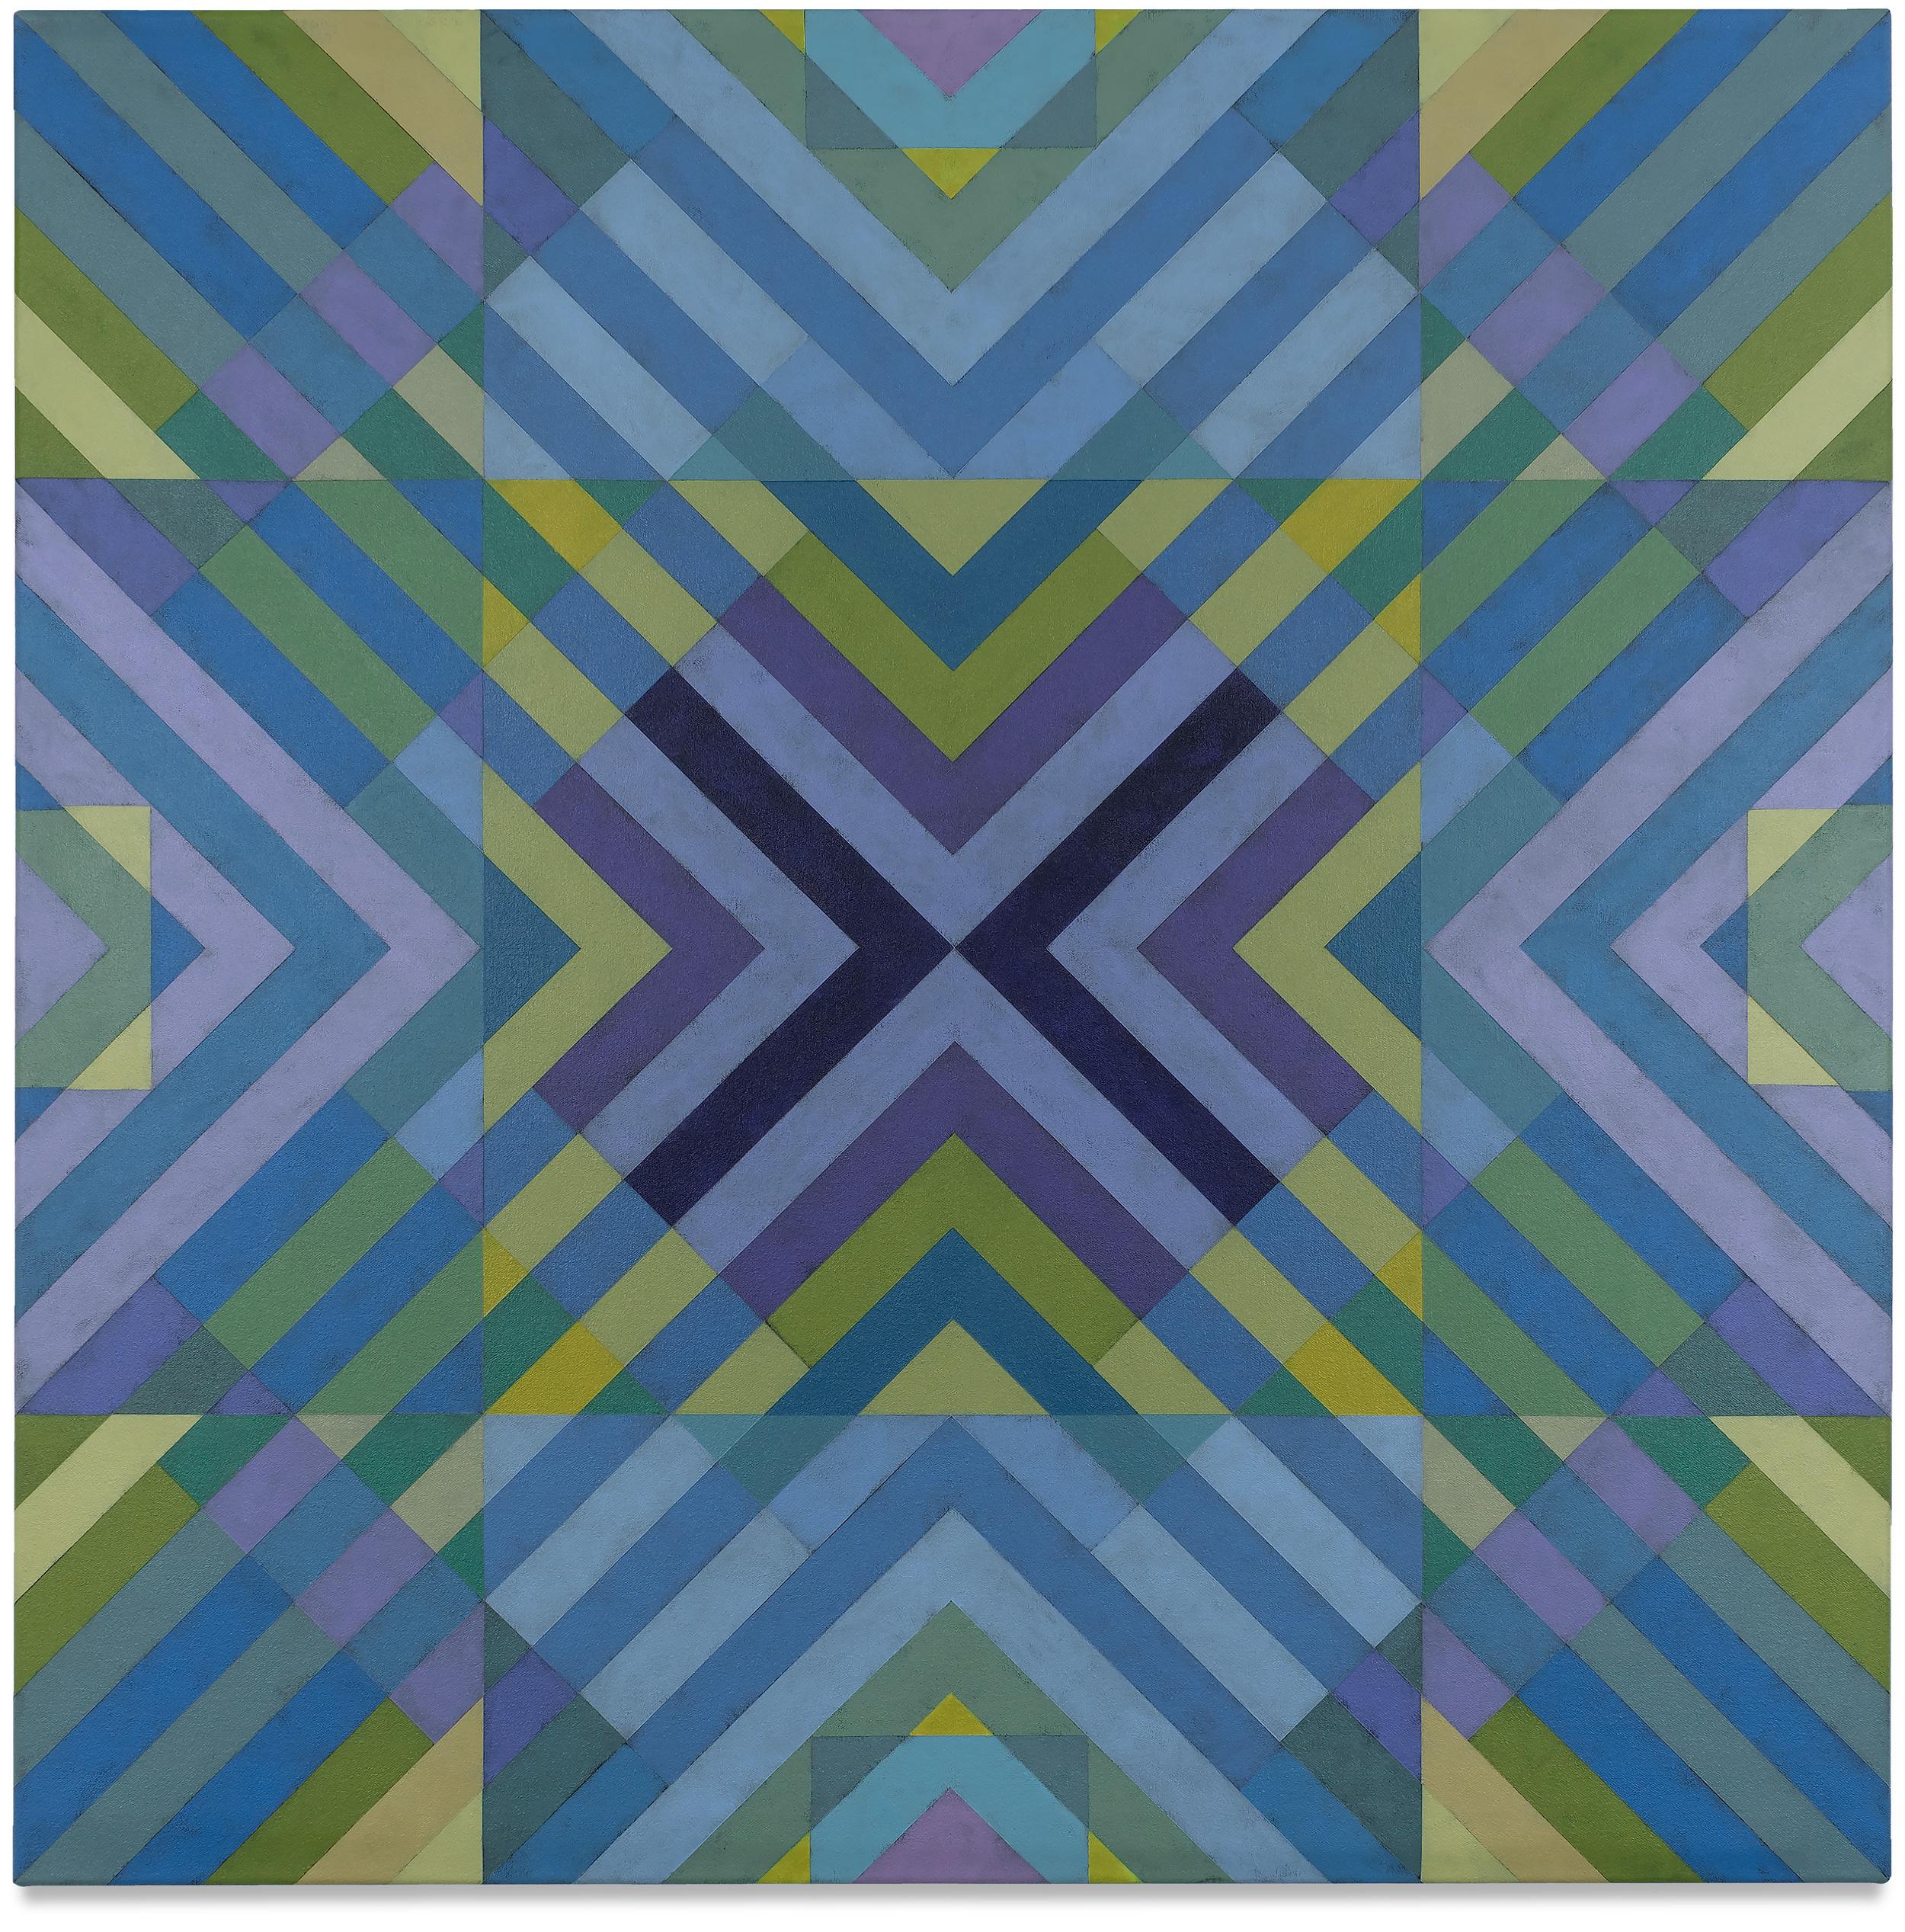 Qualia 513  acrylic on canvas 36 x 36 inches 2017